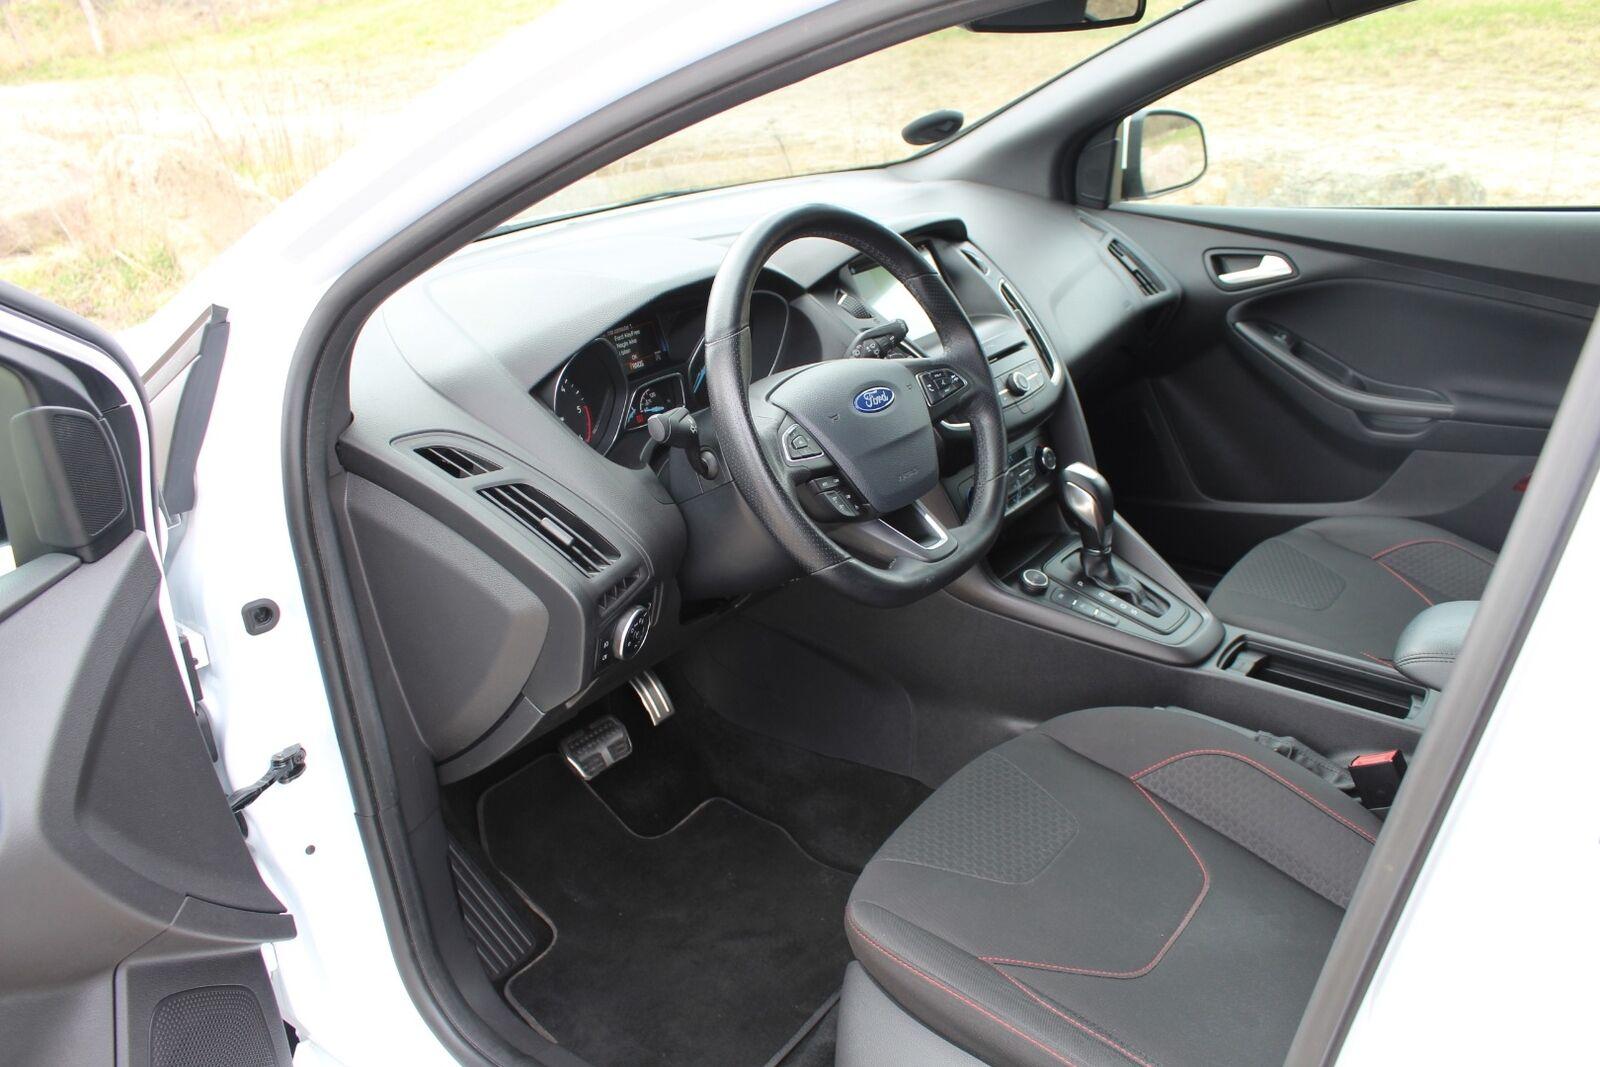 Ford Focus 1,5 TDCi 120 ST-Line stc. aut. - billede 8